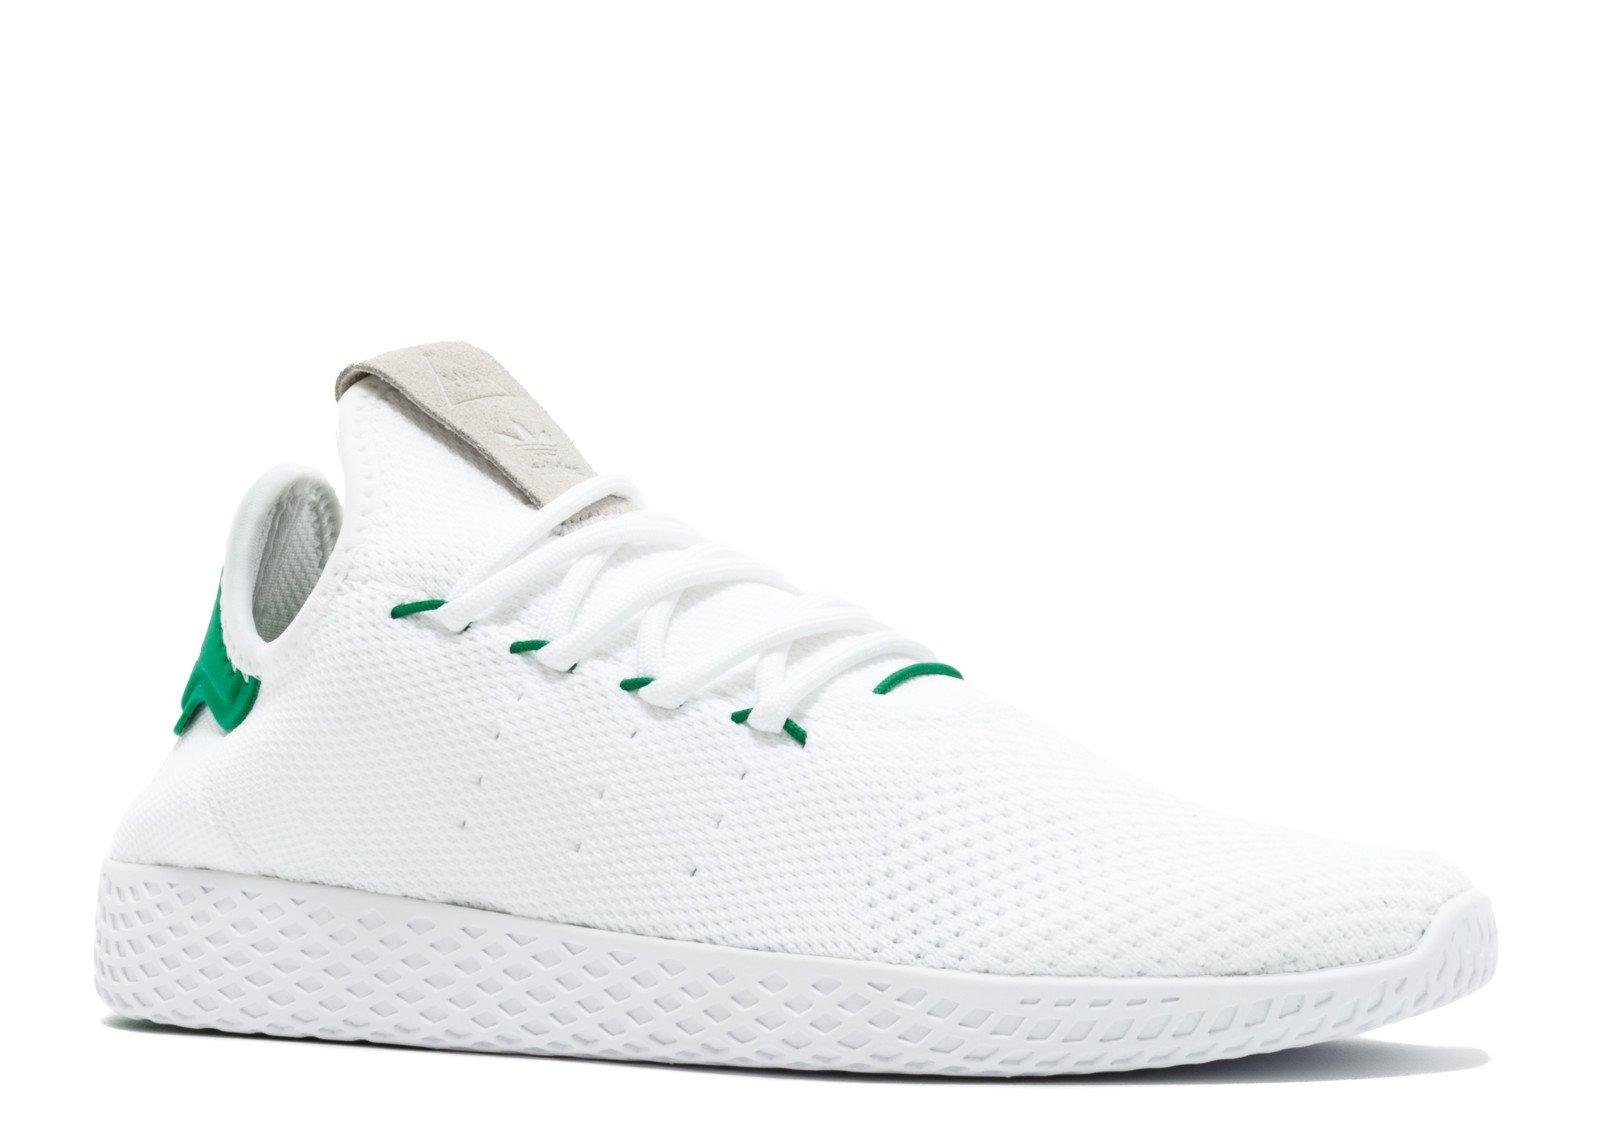 wholesale dealer d07c5 8bae6 Adidas PW Tennis HU